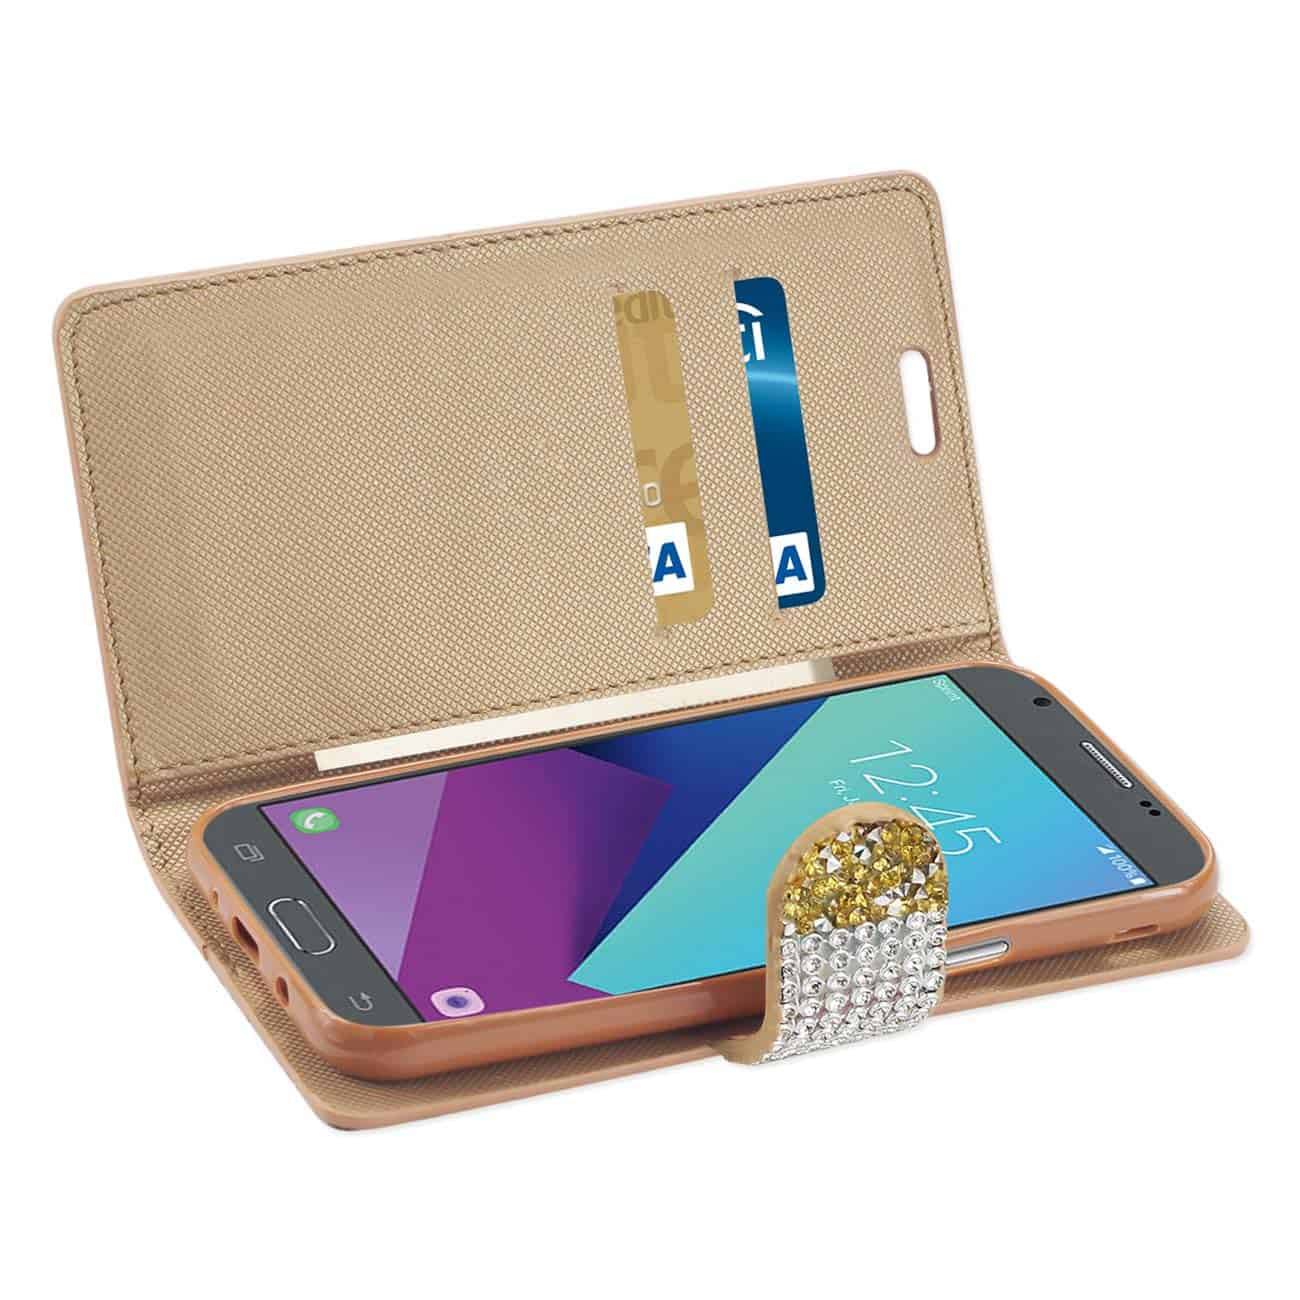 Samsung Galaxy J3 Emerge Diamond Rhinestone Wallet Case In Gold